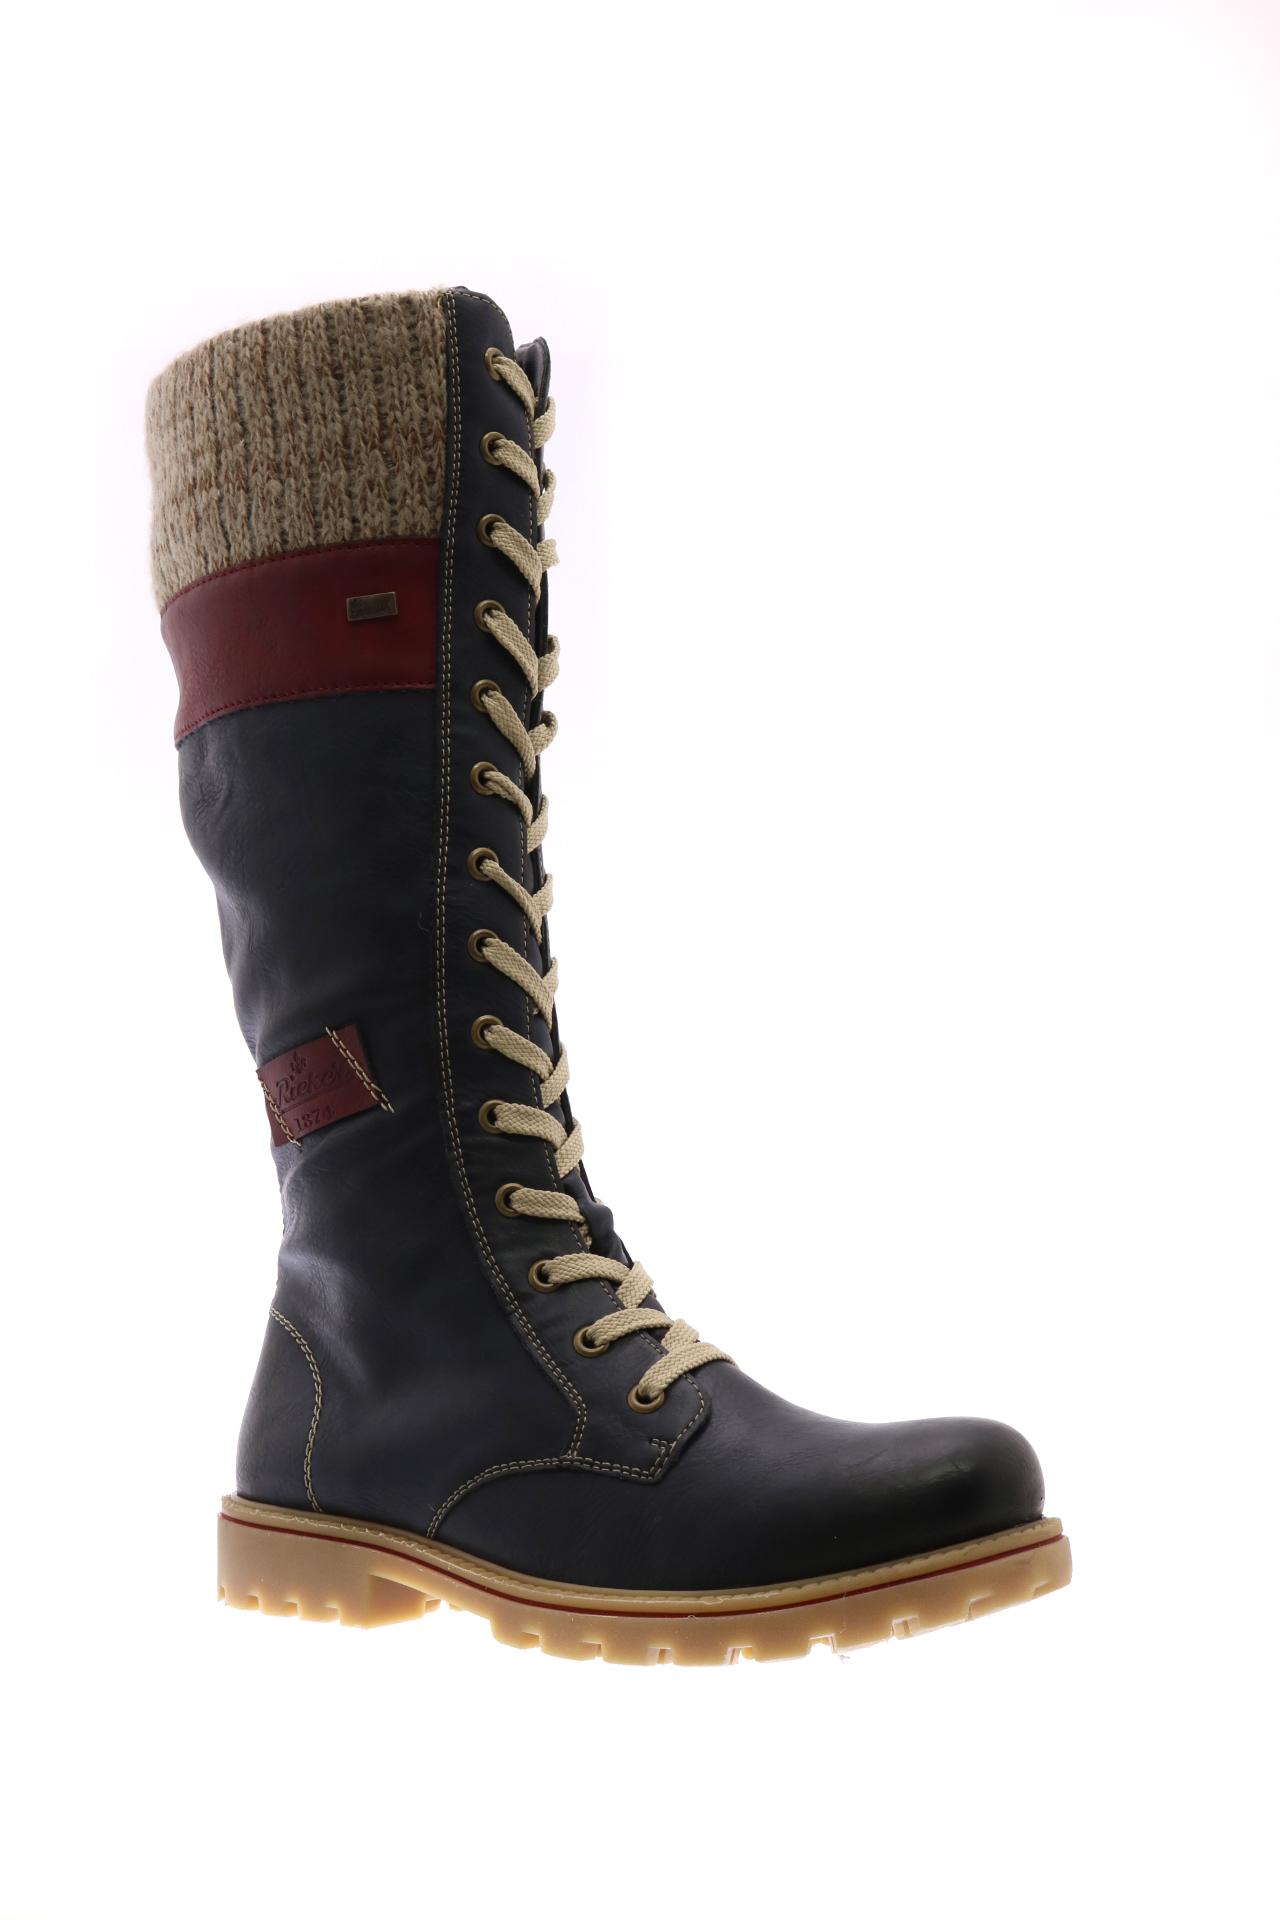 Rieker Z1442 14 | Caron Chaussures